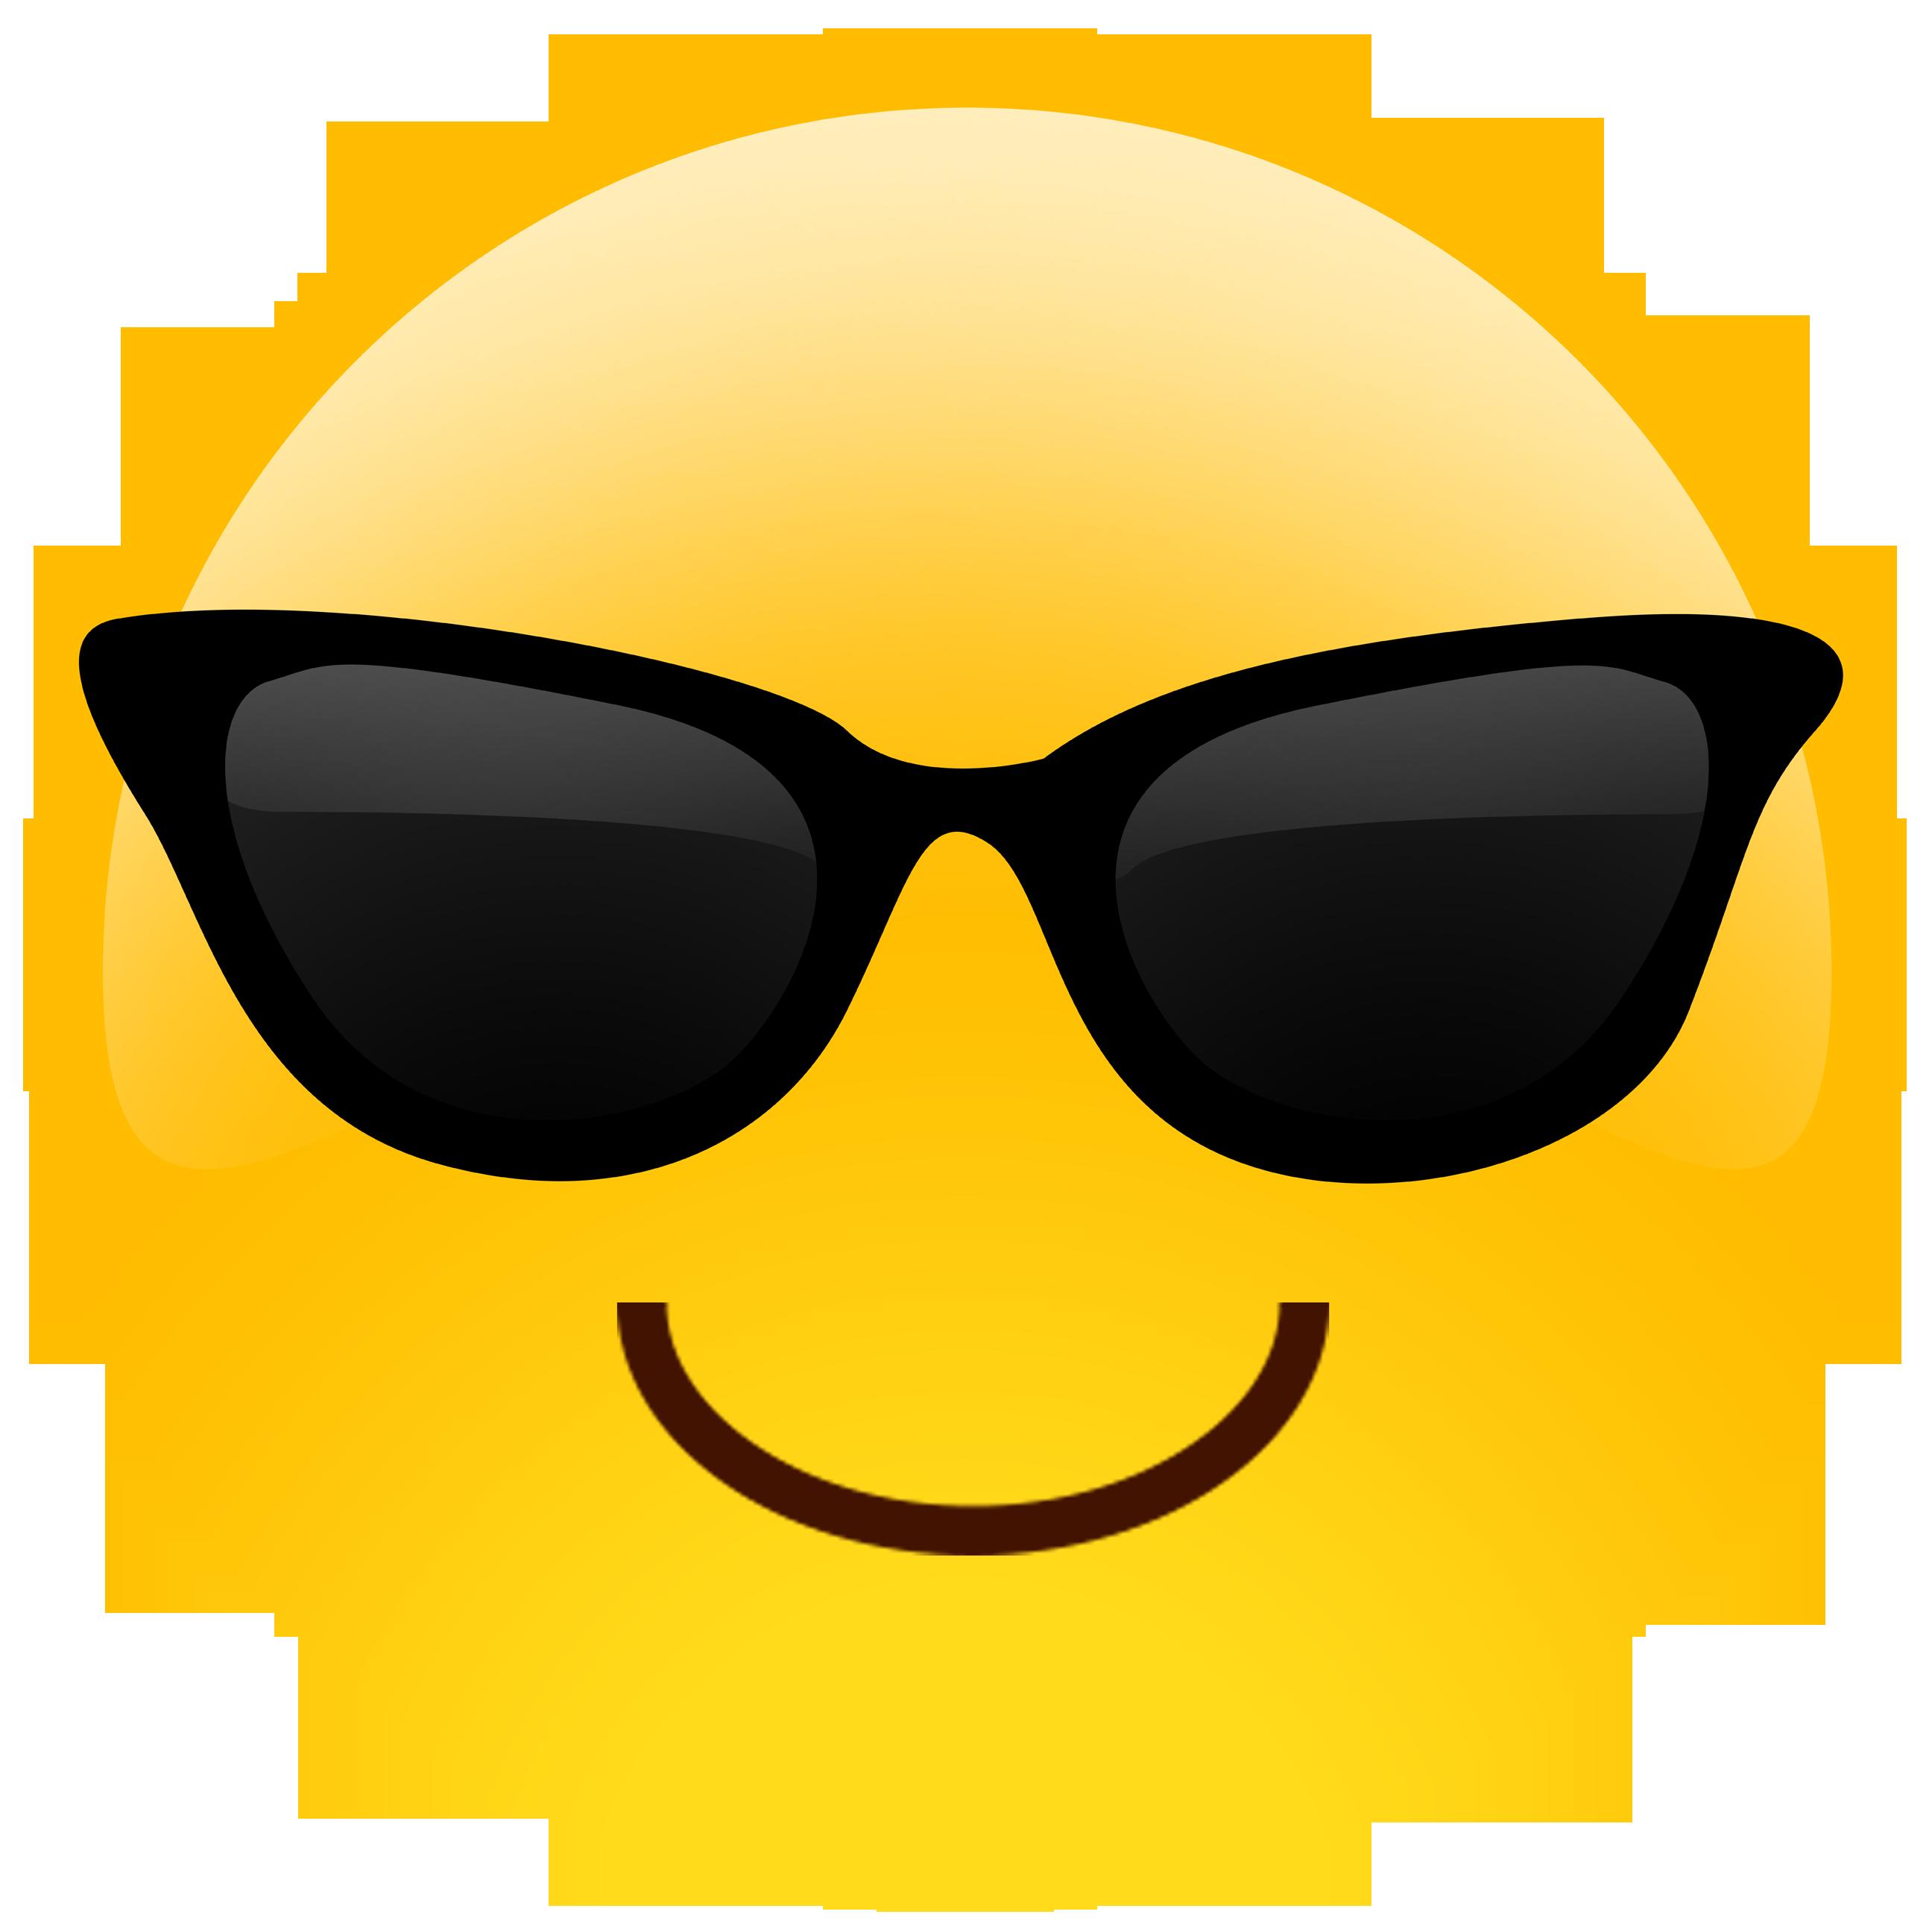 Sun glass cutout clipart banner Sunglasses Emoji Cutouts | Pinterest | Emoji, Big head cutouts and ... banner